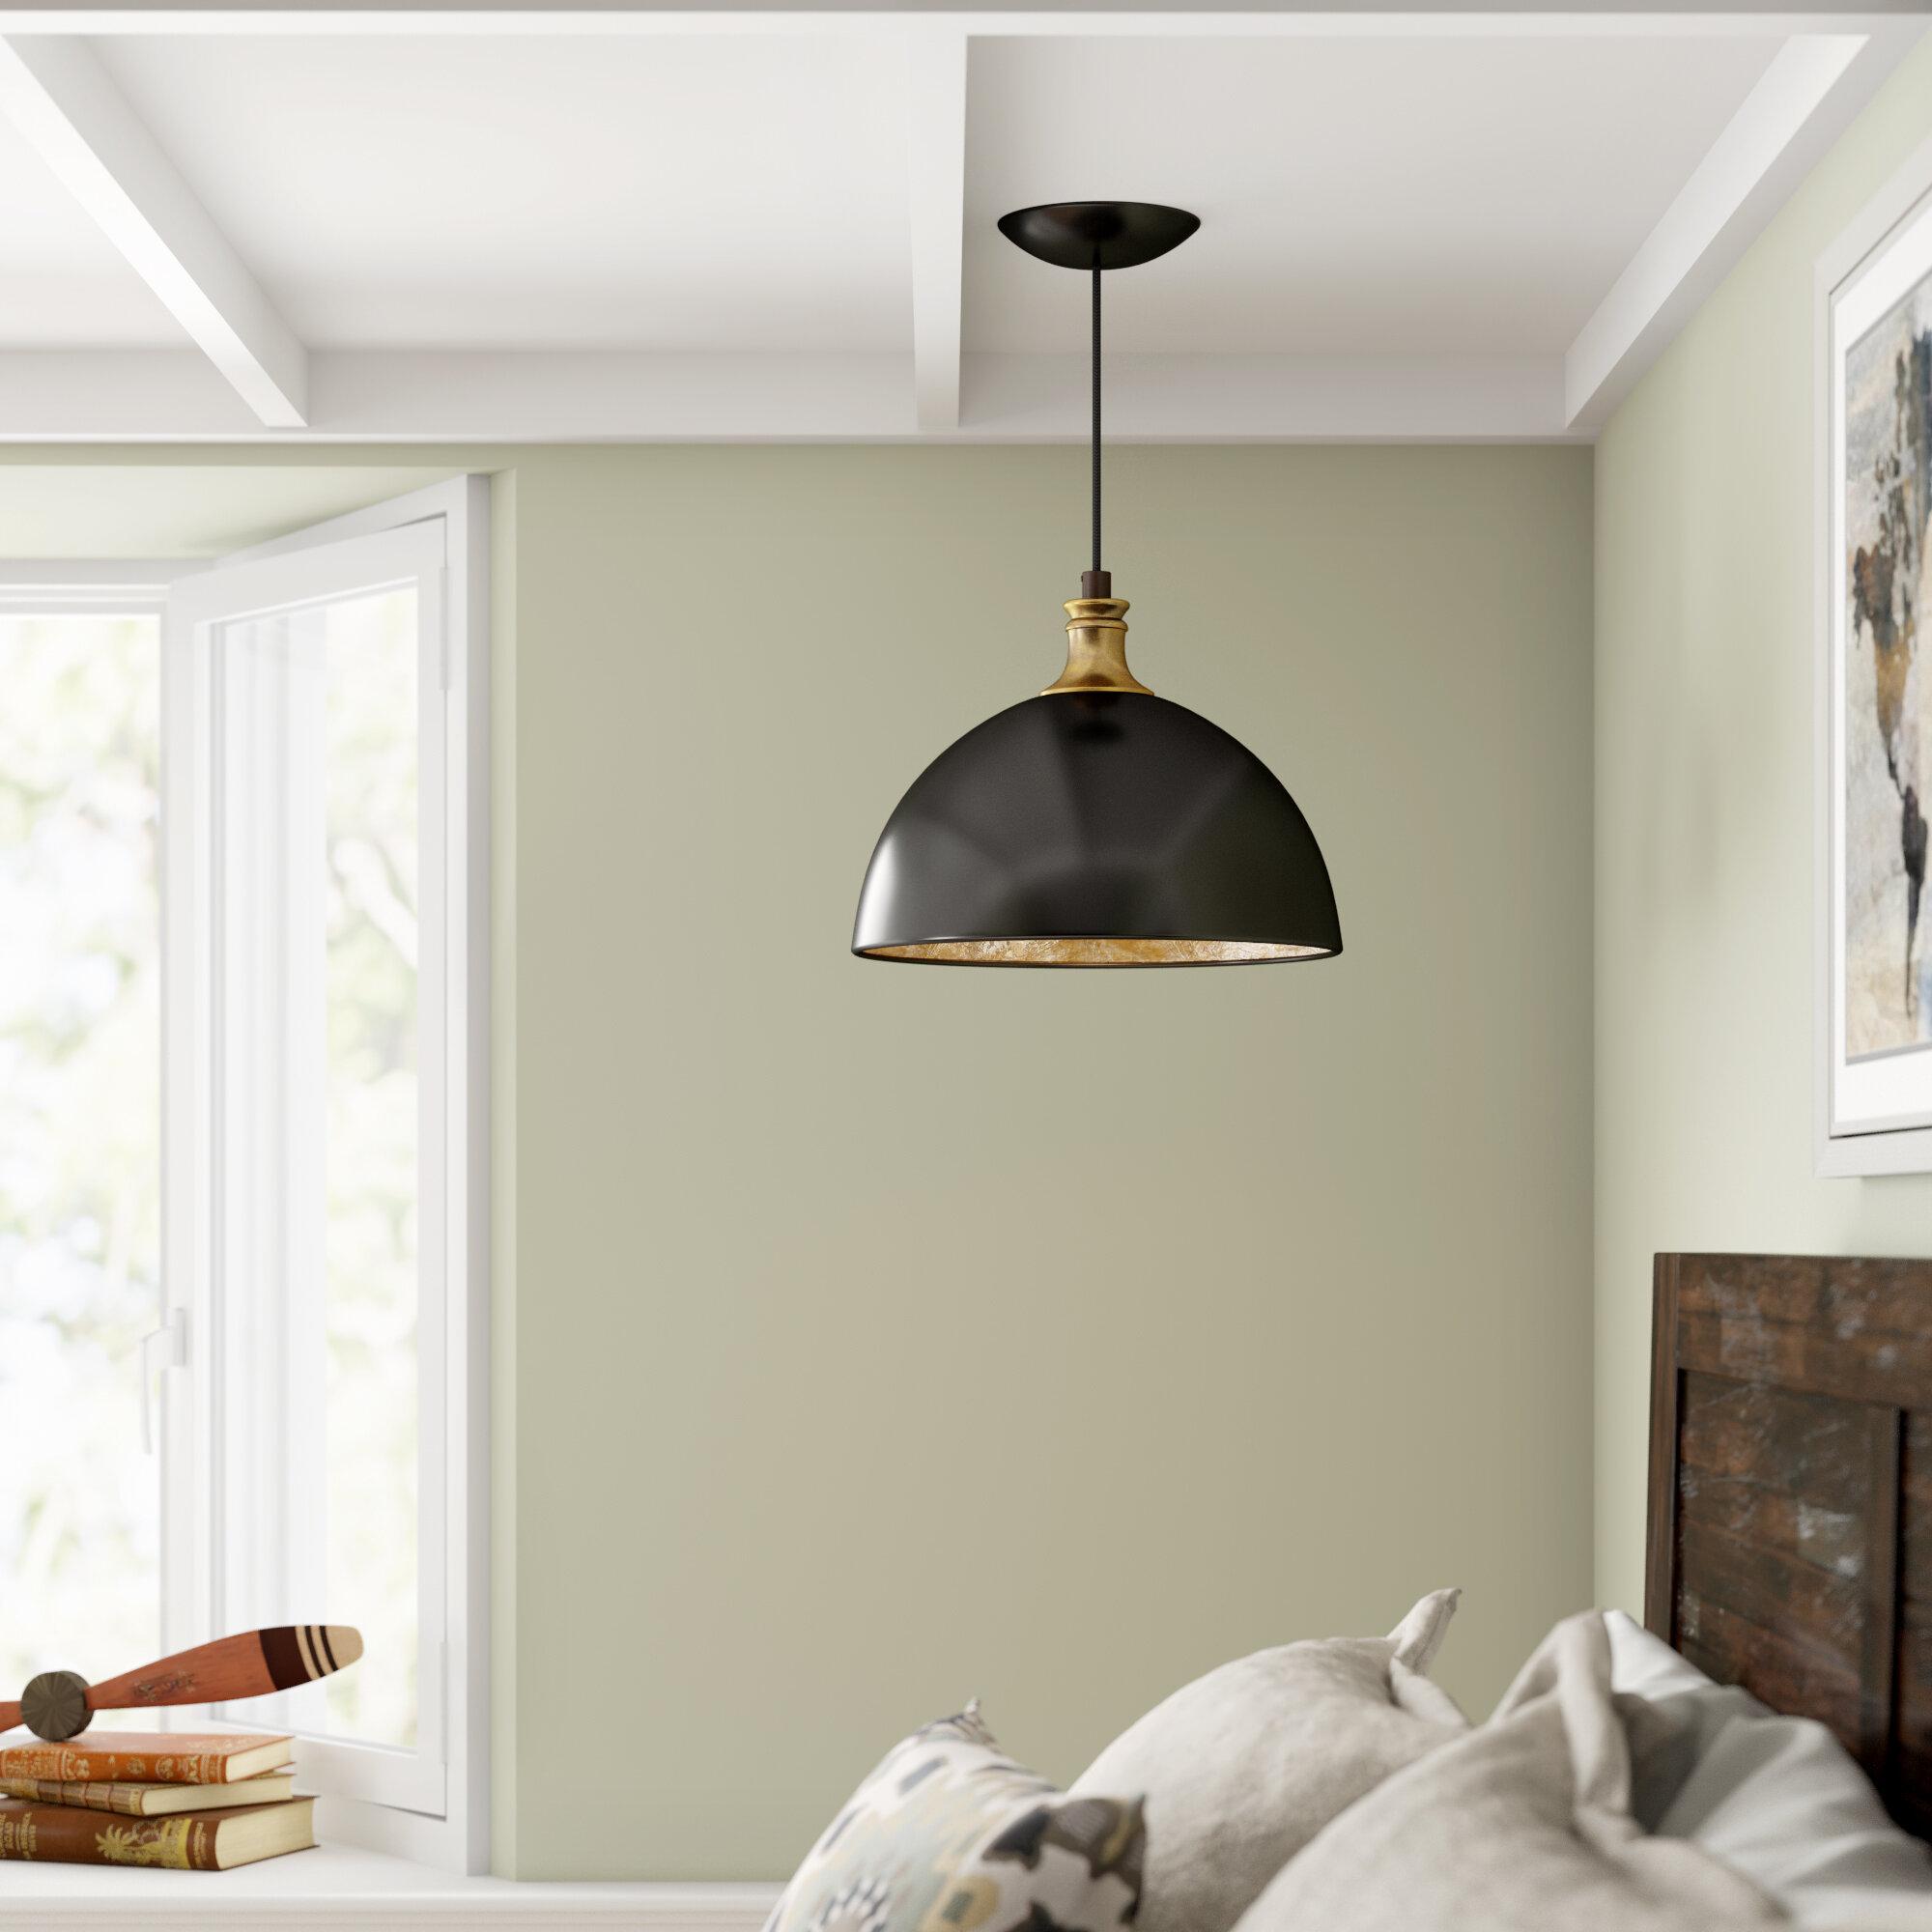 Oversized Dome Pendant Light | Wayfair Regarding Monadnock 1 Light Single Dome Pendants (View 23 of 30)